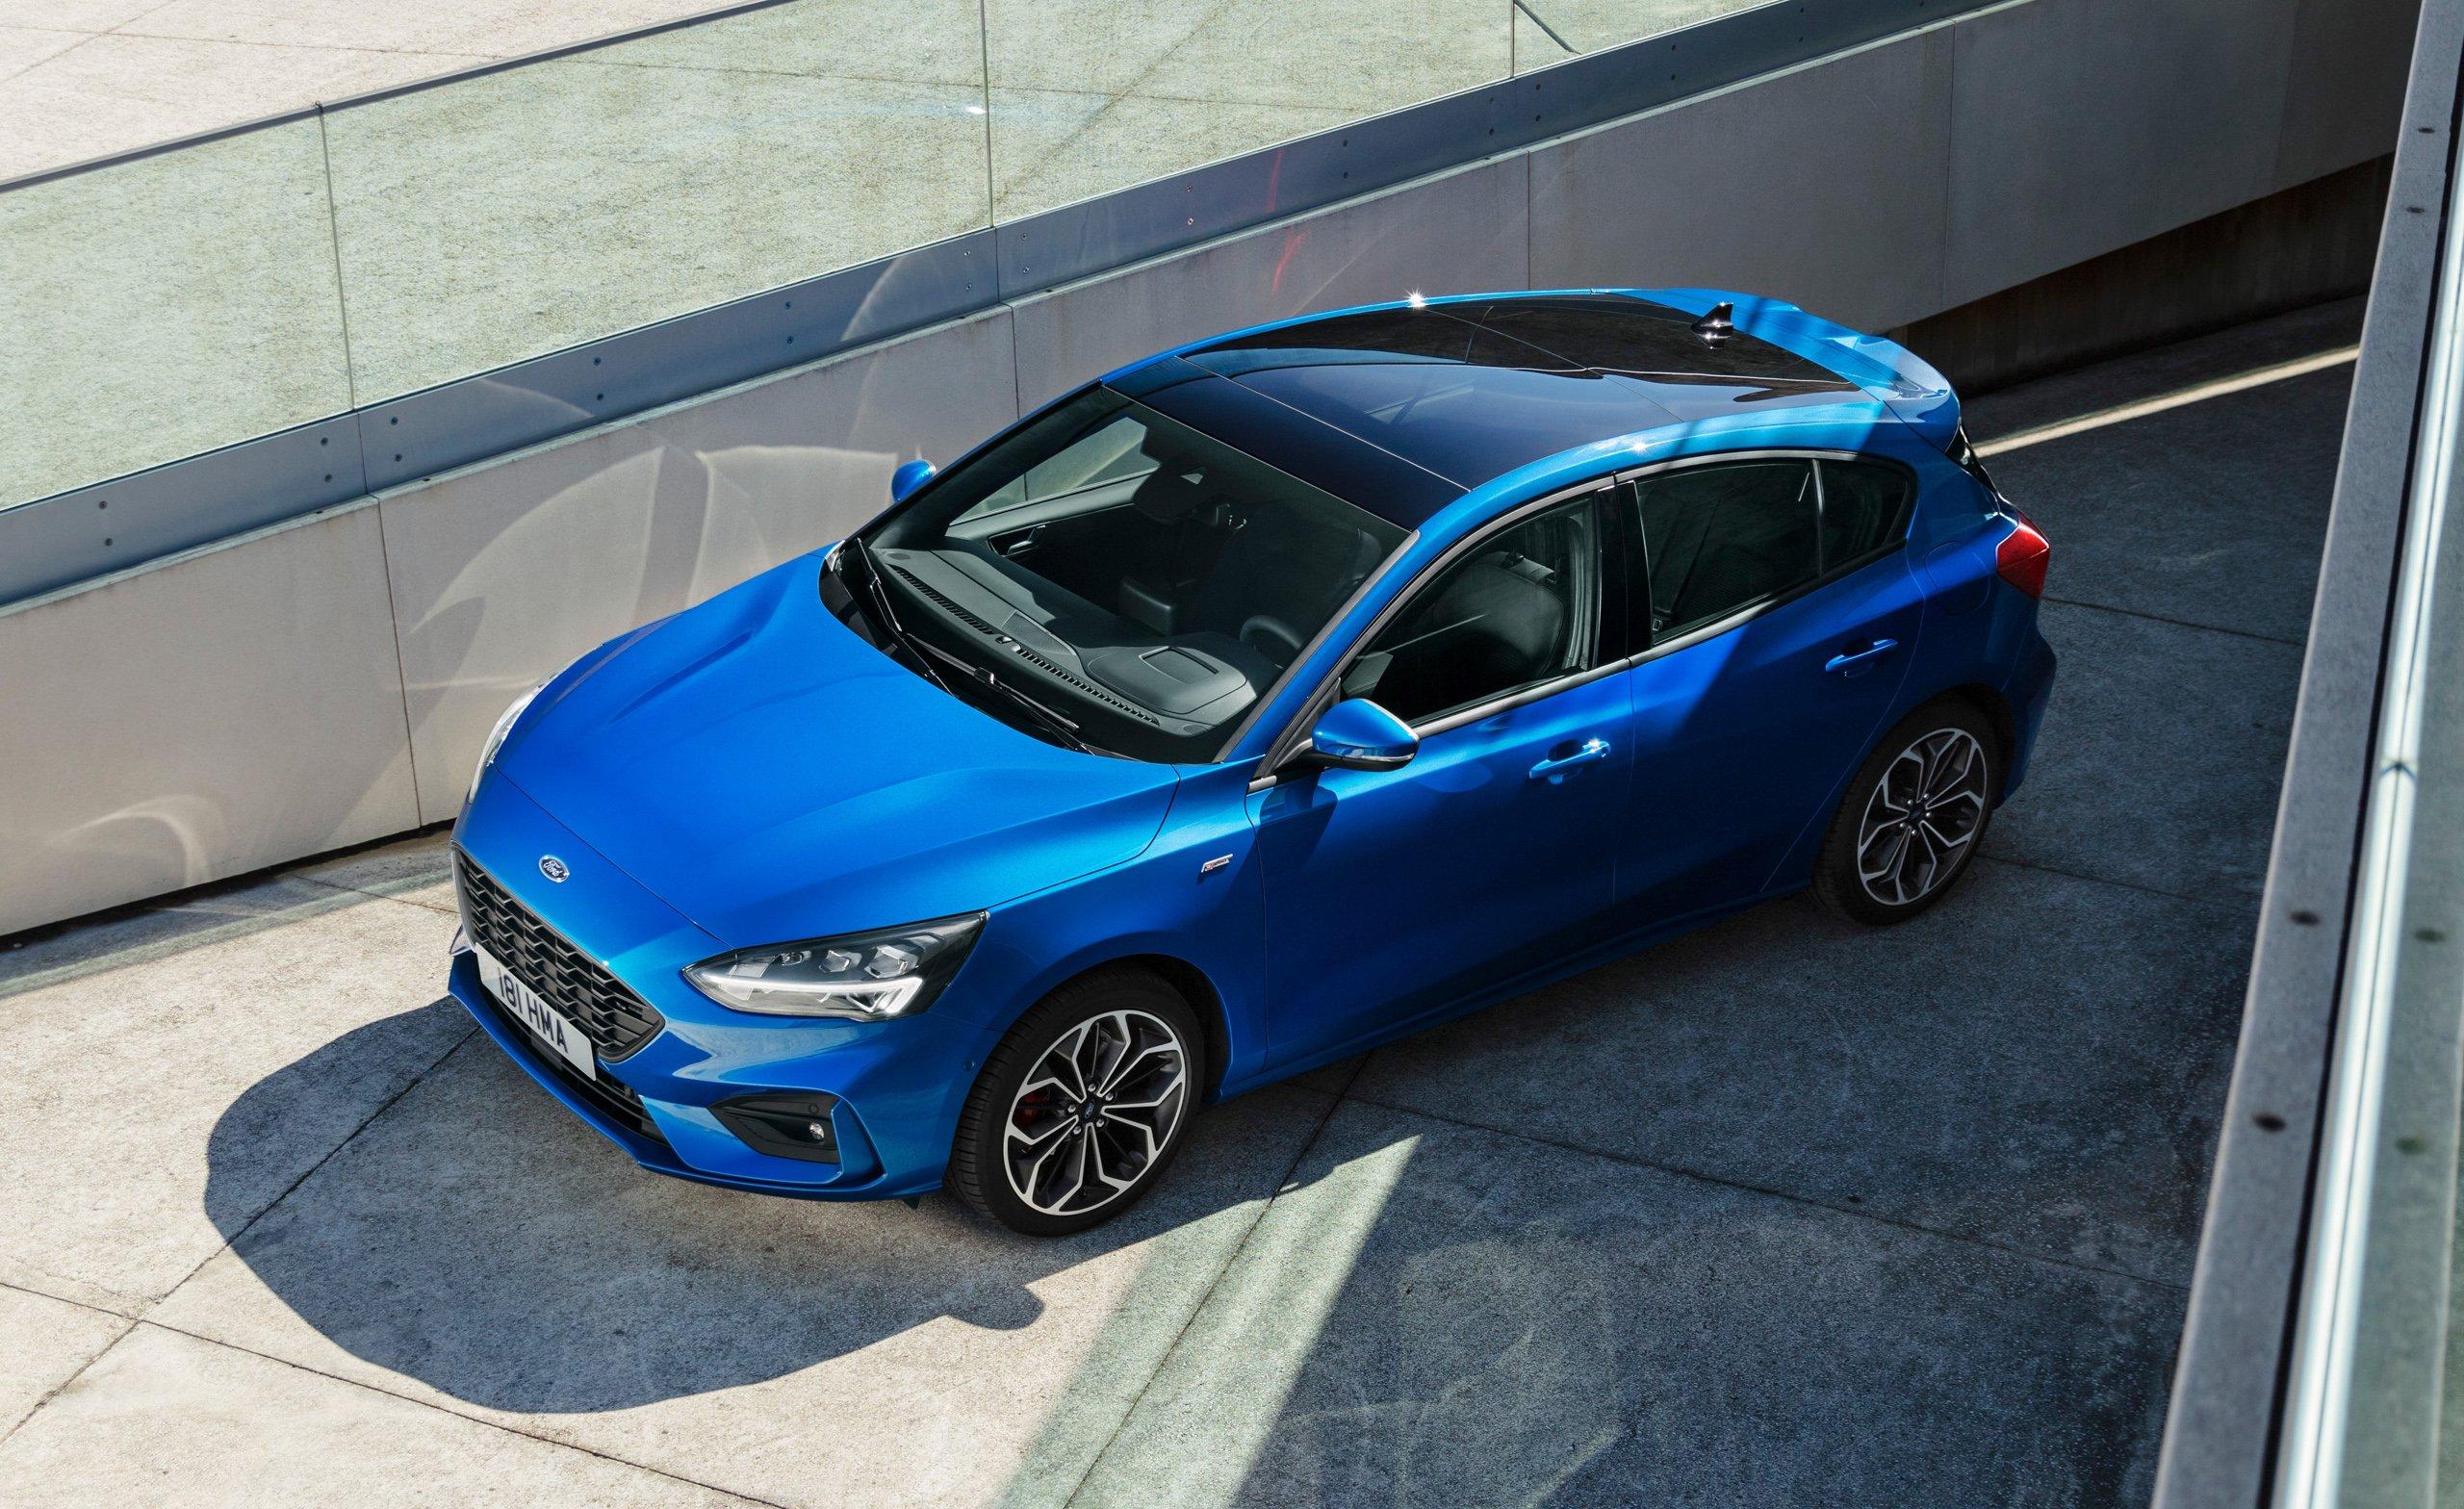 Ford Focus 2019 St >> 2019 Ford Focus Mk4 发表,新增跨界版车型、六种等级可选、EcoBoost / EcoBlue 引擎,改搭八速自排变速箱 2019 Ford Focus Mk4 hatch ...